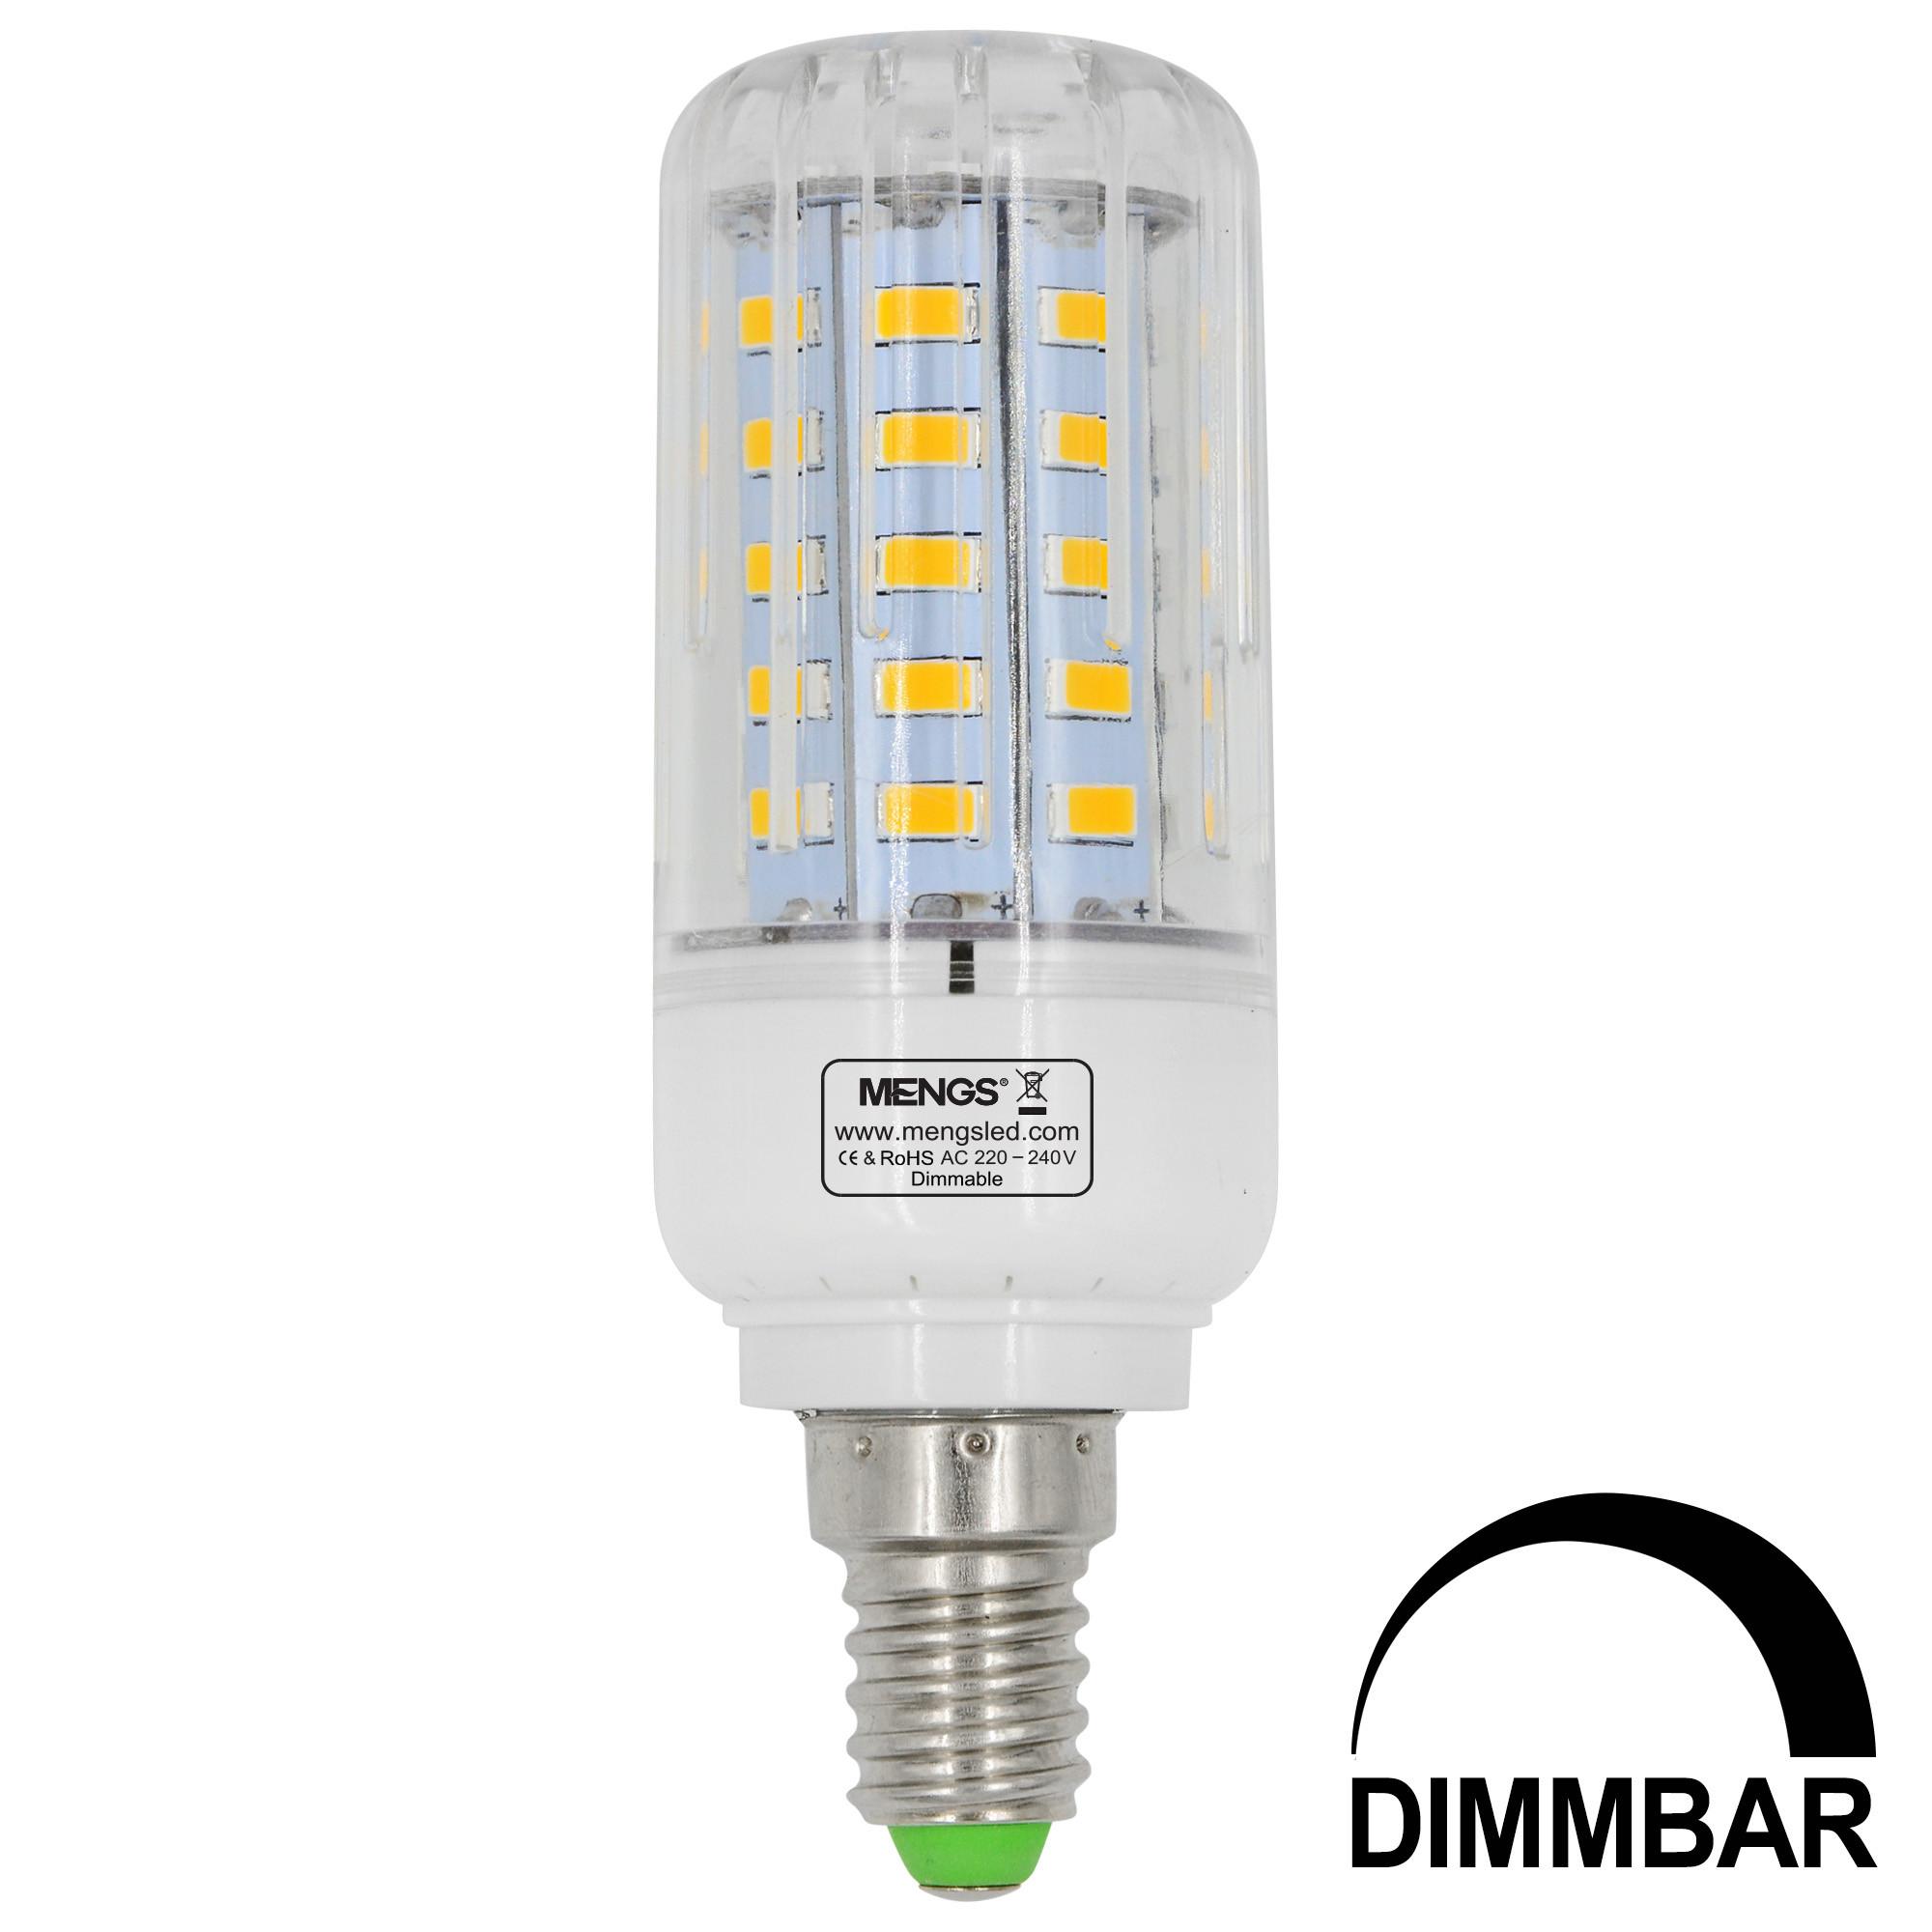 e14 7w led dimmable corn light 50x 5736 smd led bulb lamp ac 220 240v in warm white energy. Black Bedroom Furniture Sets. Home Design Ideas